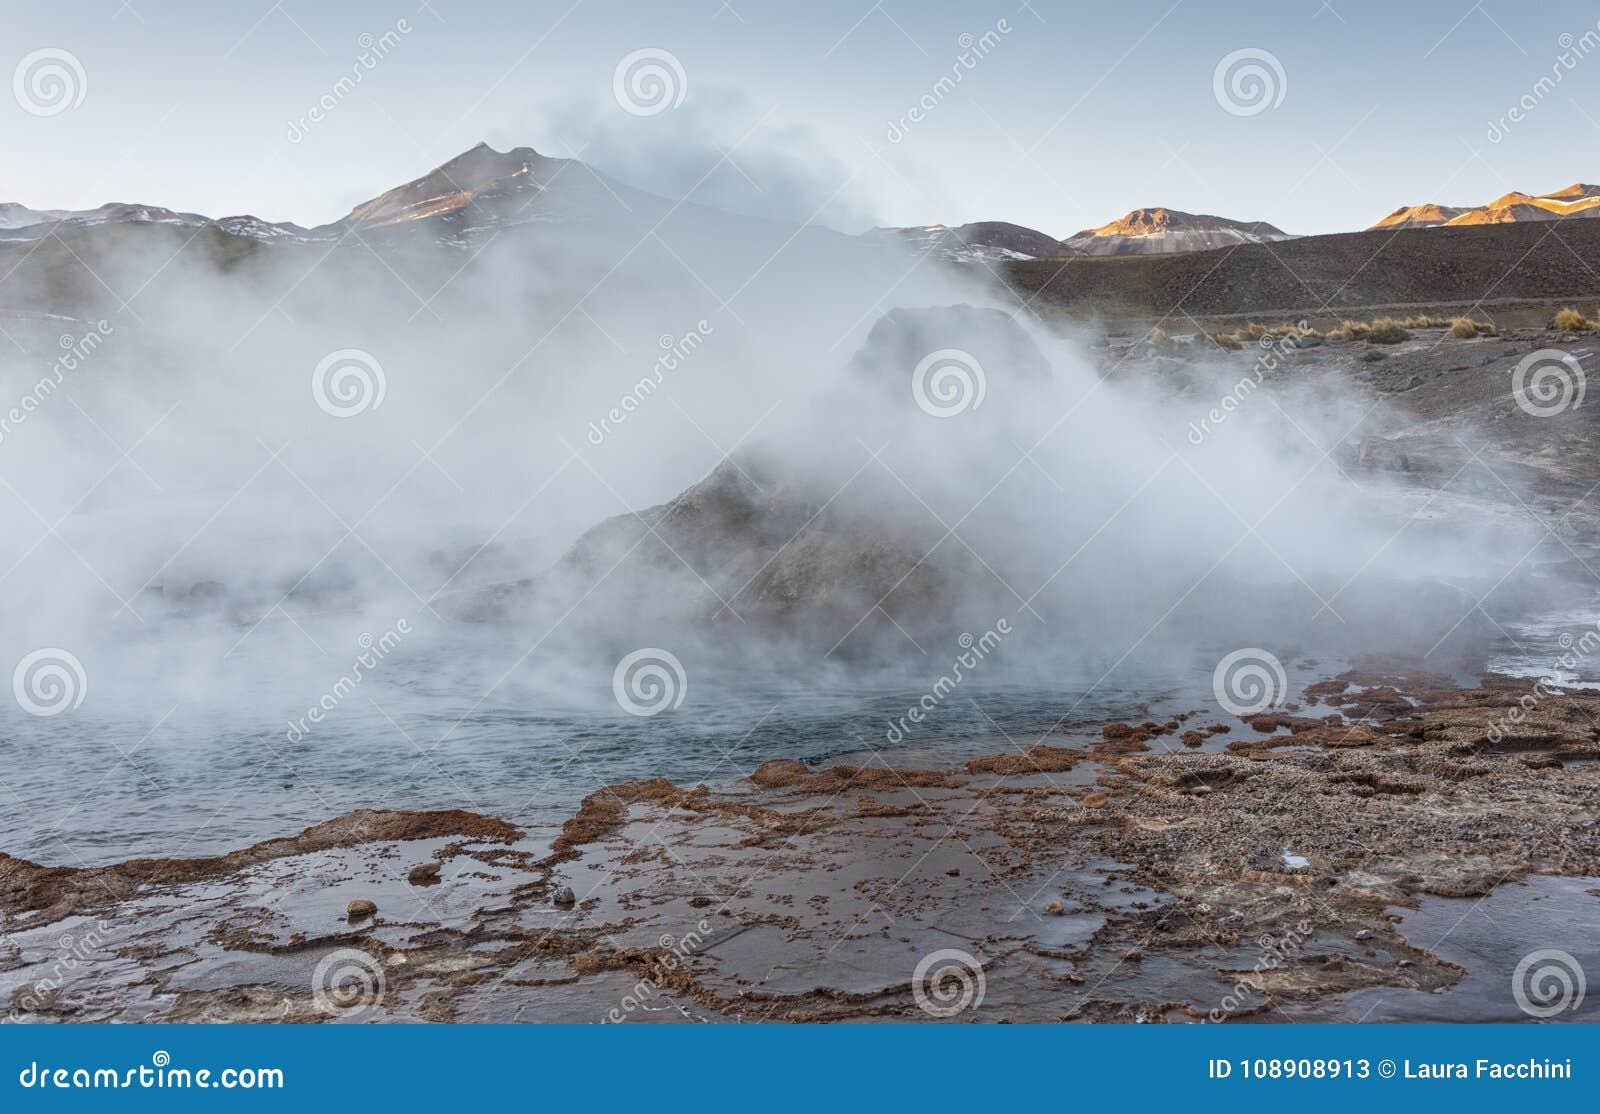 El Tatio geysers, the biggest geysers of the southern hemisphere close to the plateau of San Pedro de Atacama, Calama, Antofagasta